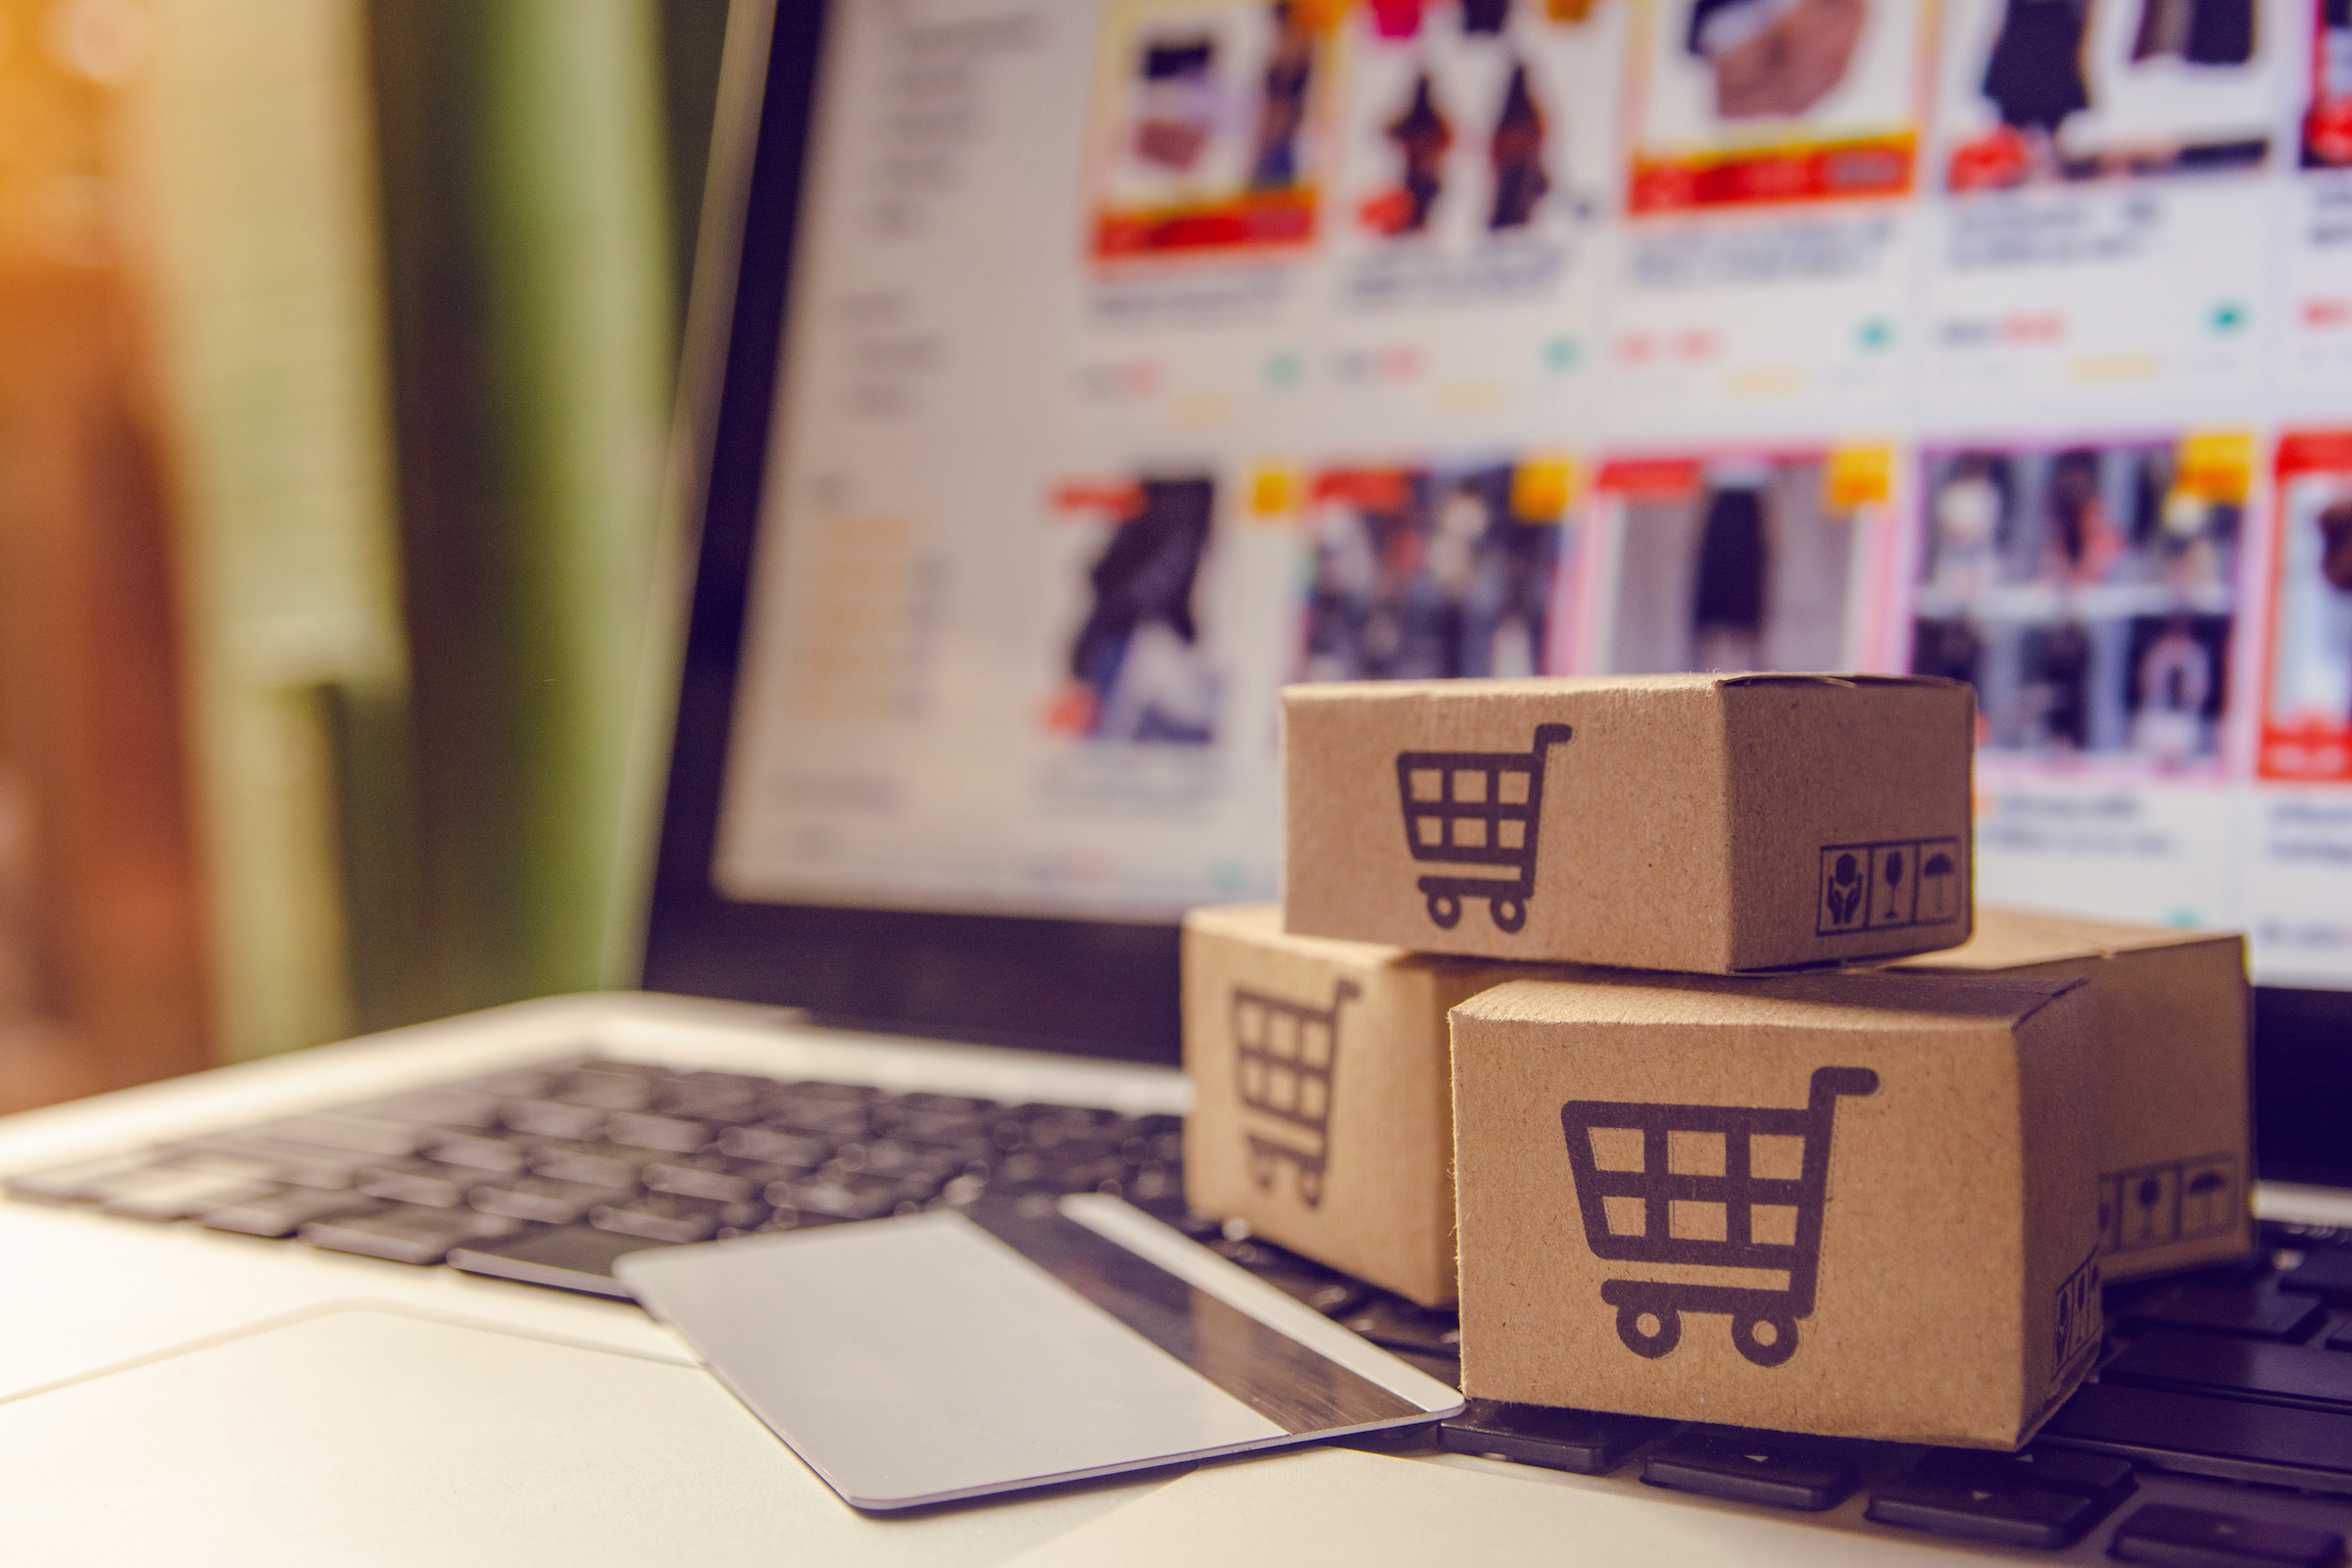 computadora, tarjeta de crédito para compras por internet